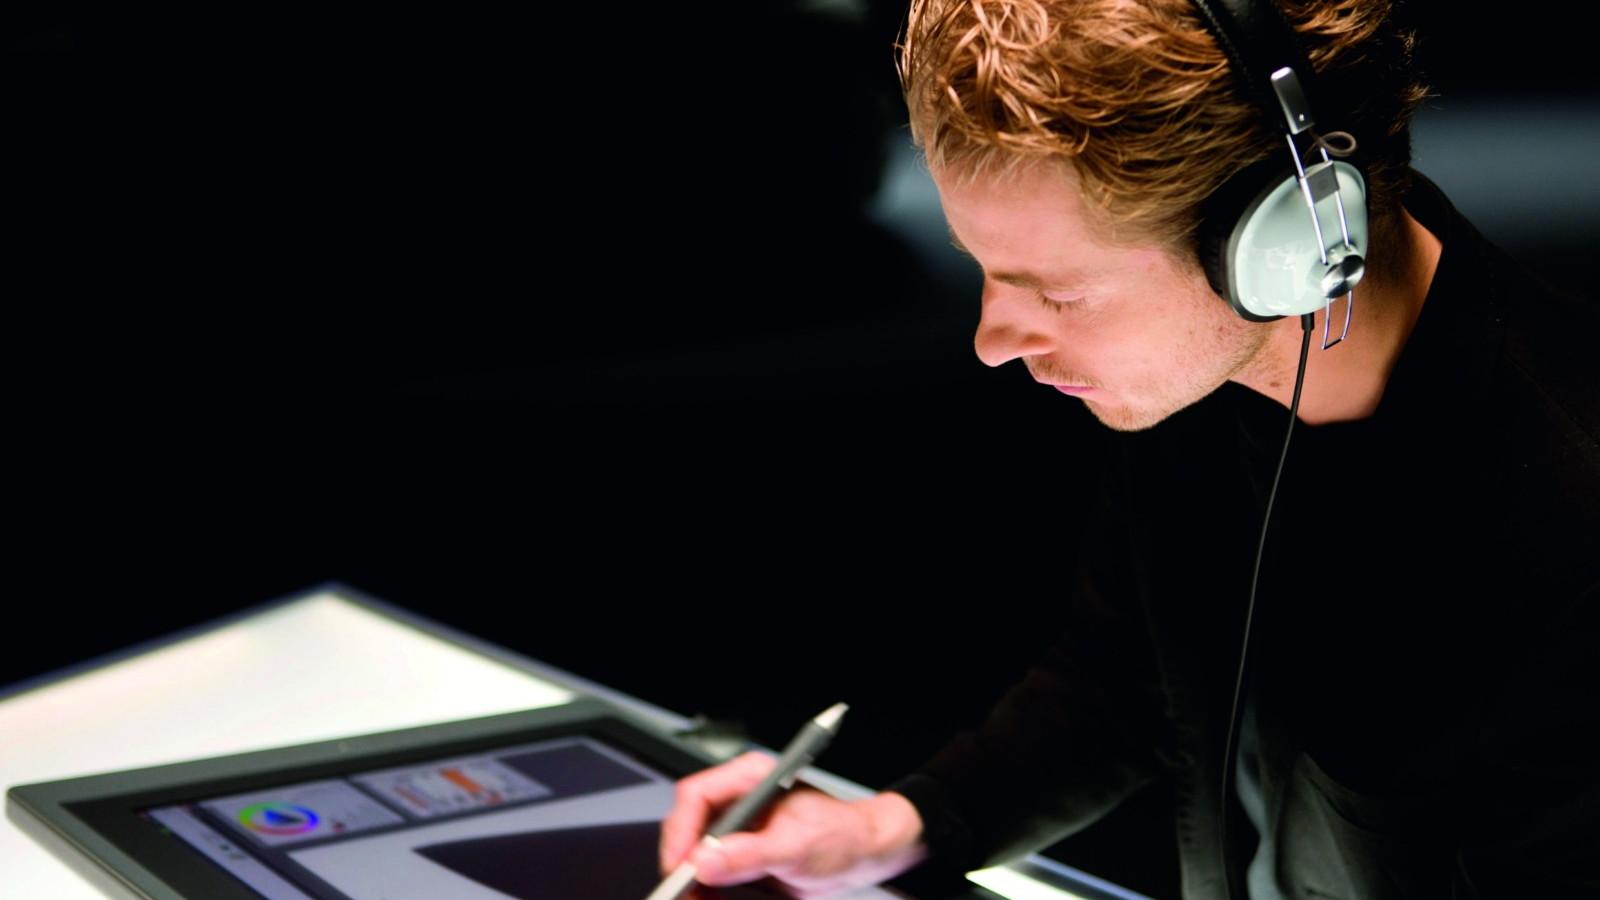 2011 Audi A1 interior design preview